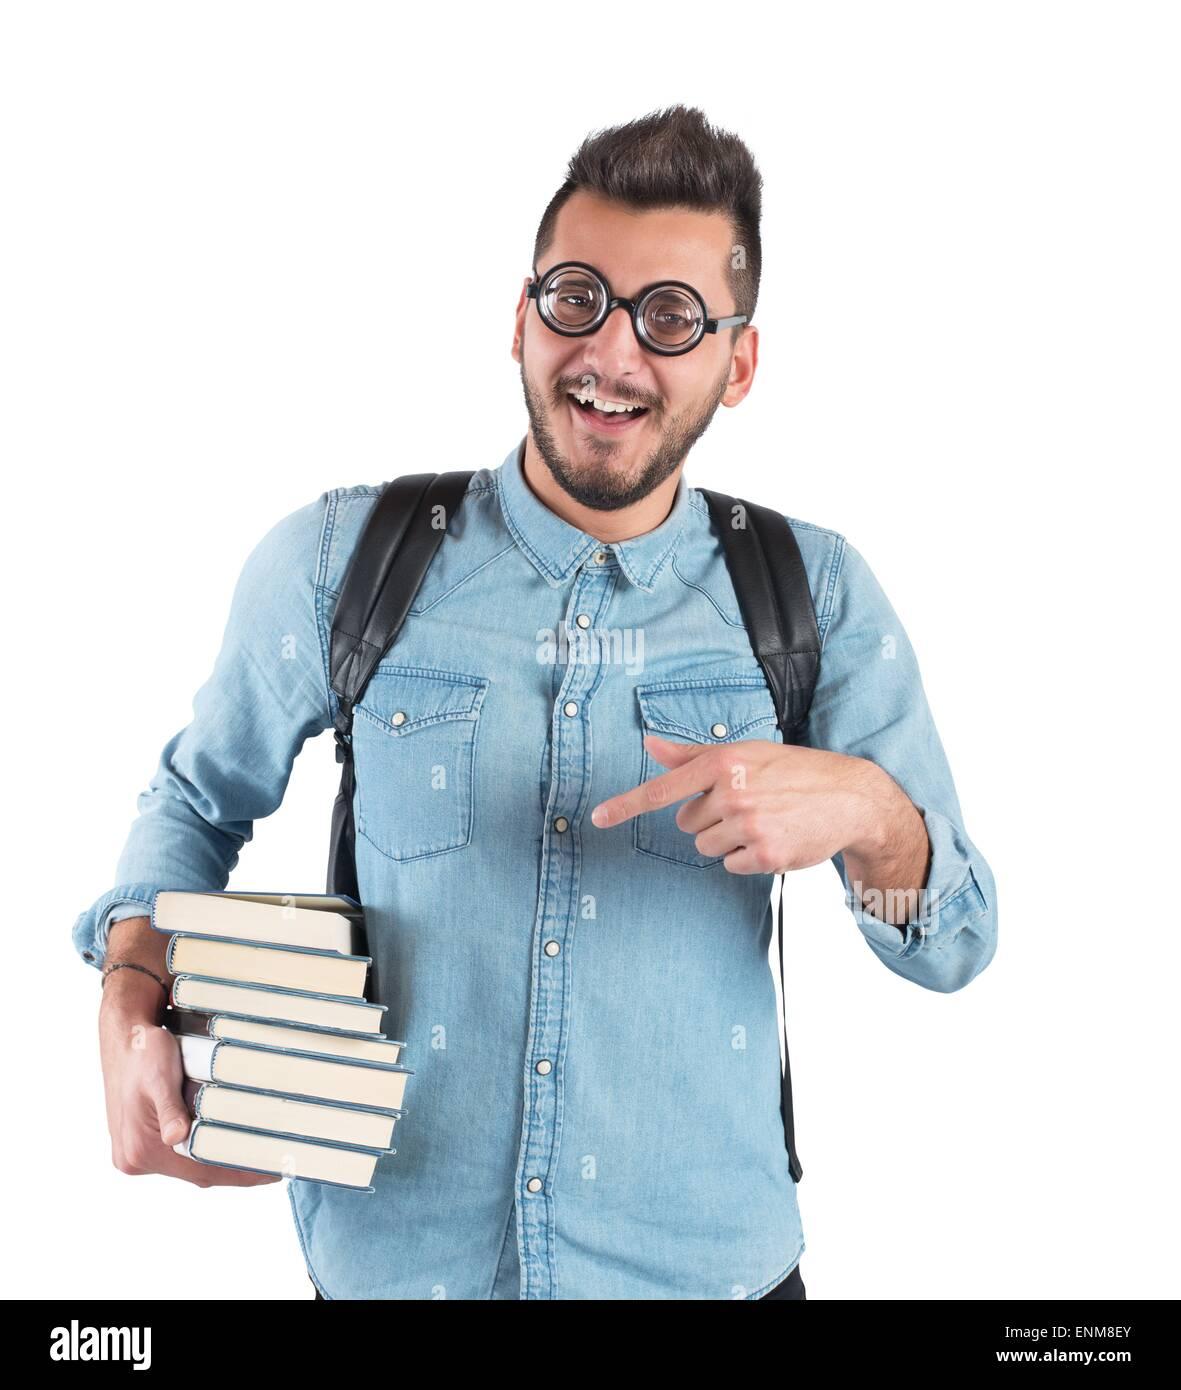 Books boy nerd - Stock Image